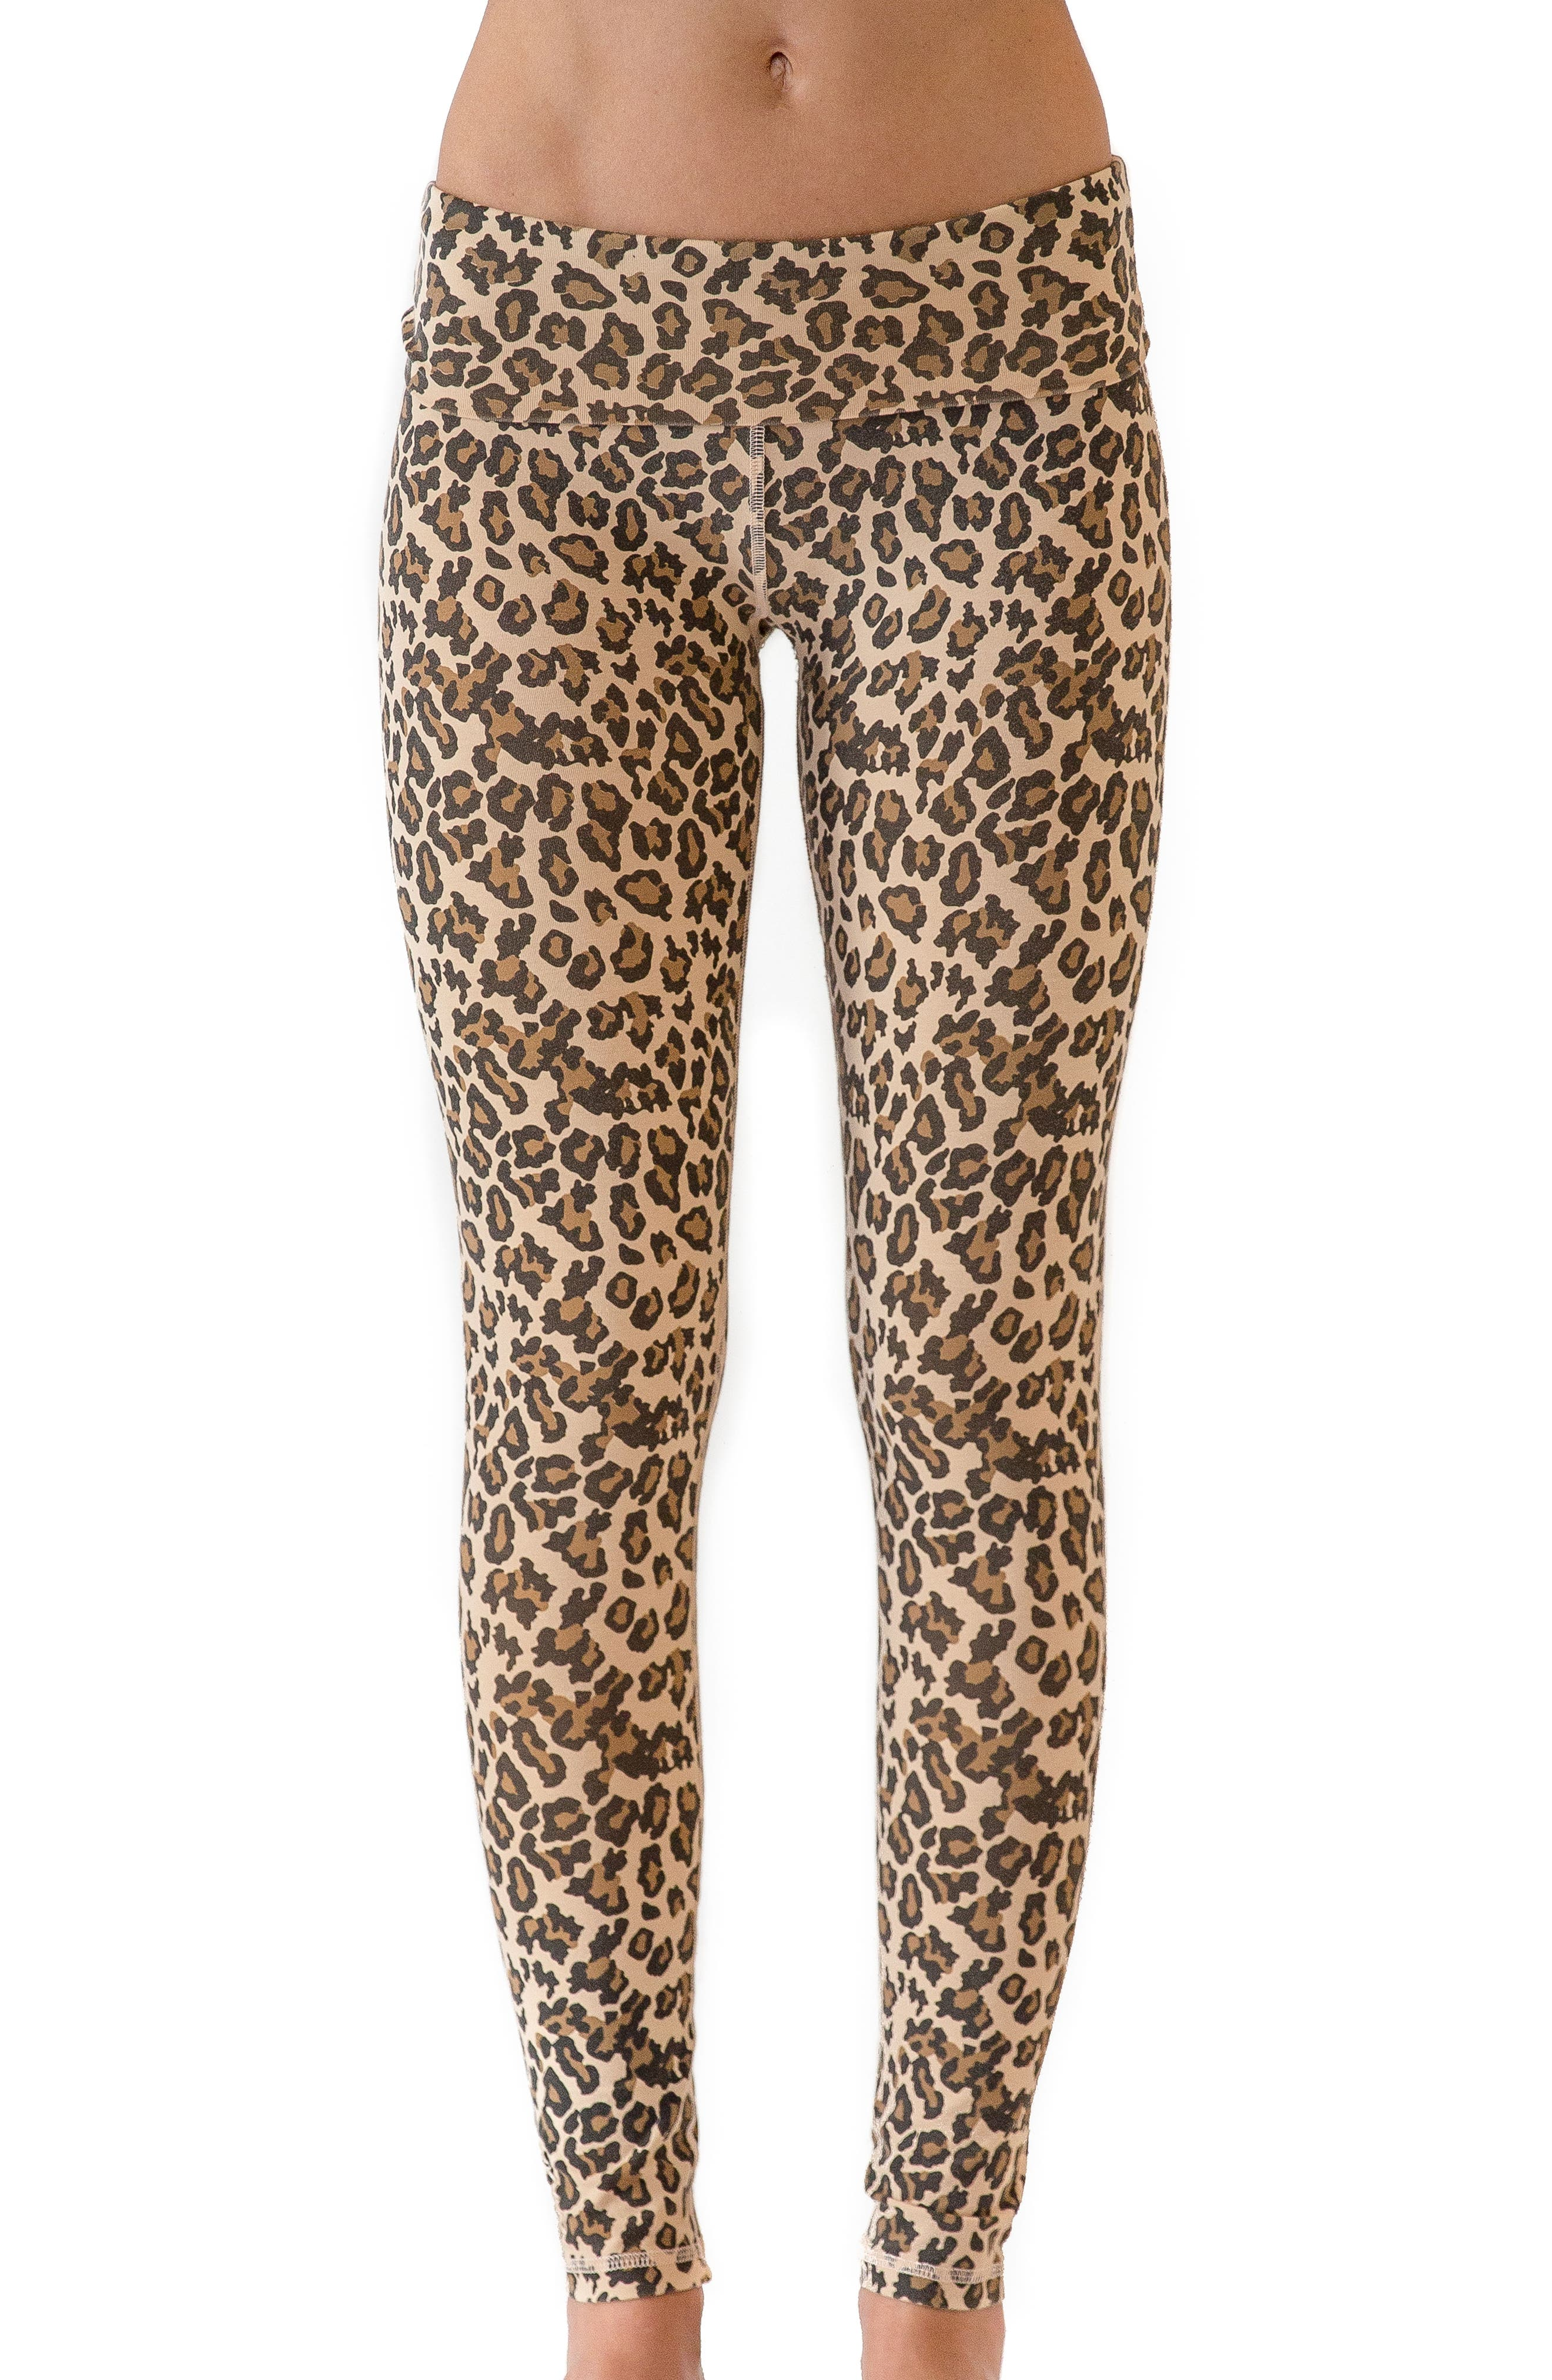 Ragdoll Leopard Print Leggings